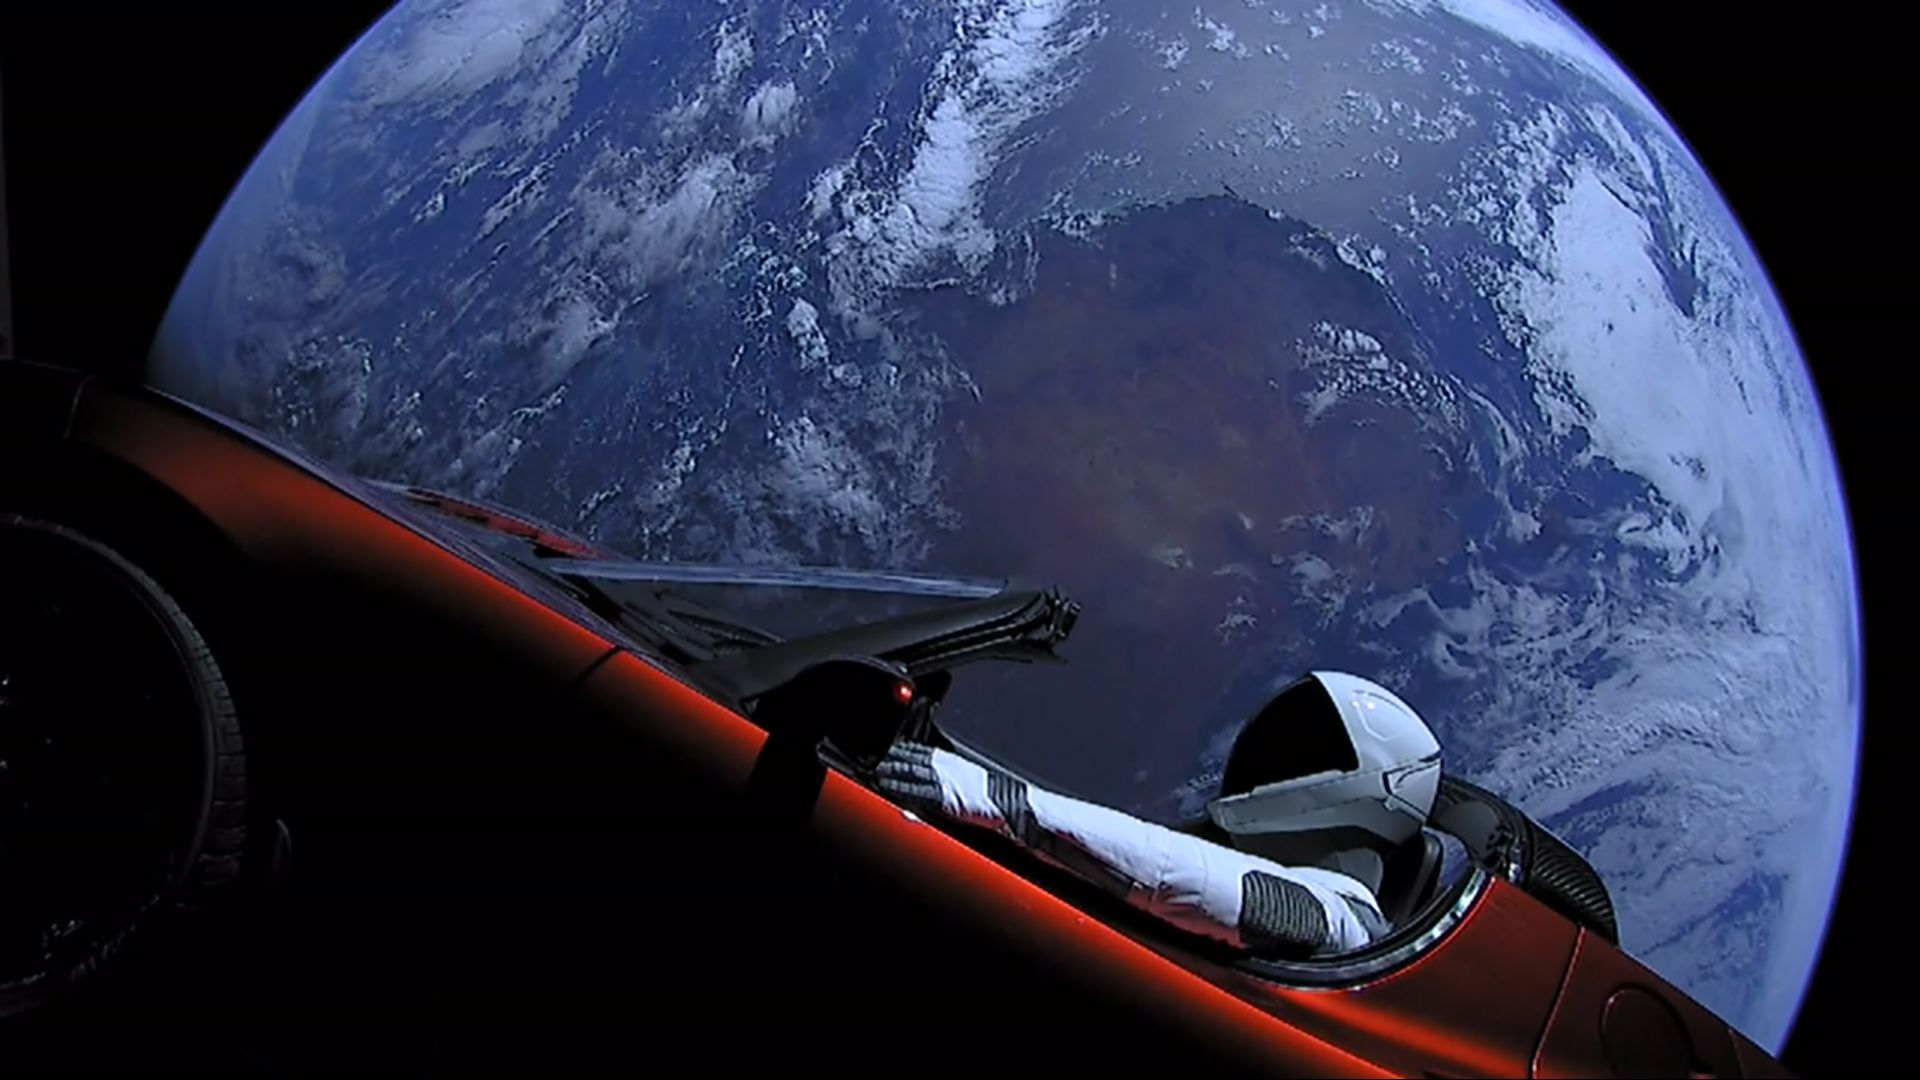 Elon Musk's Floating Starman Finally 'Drove' by Mars